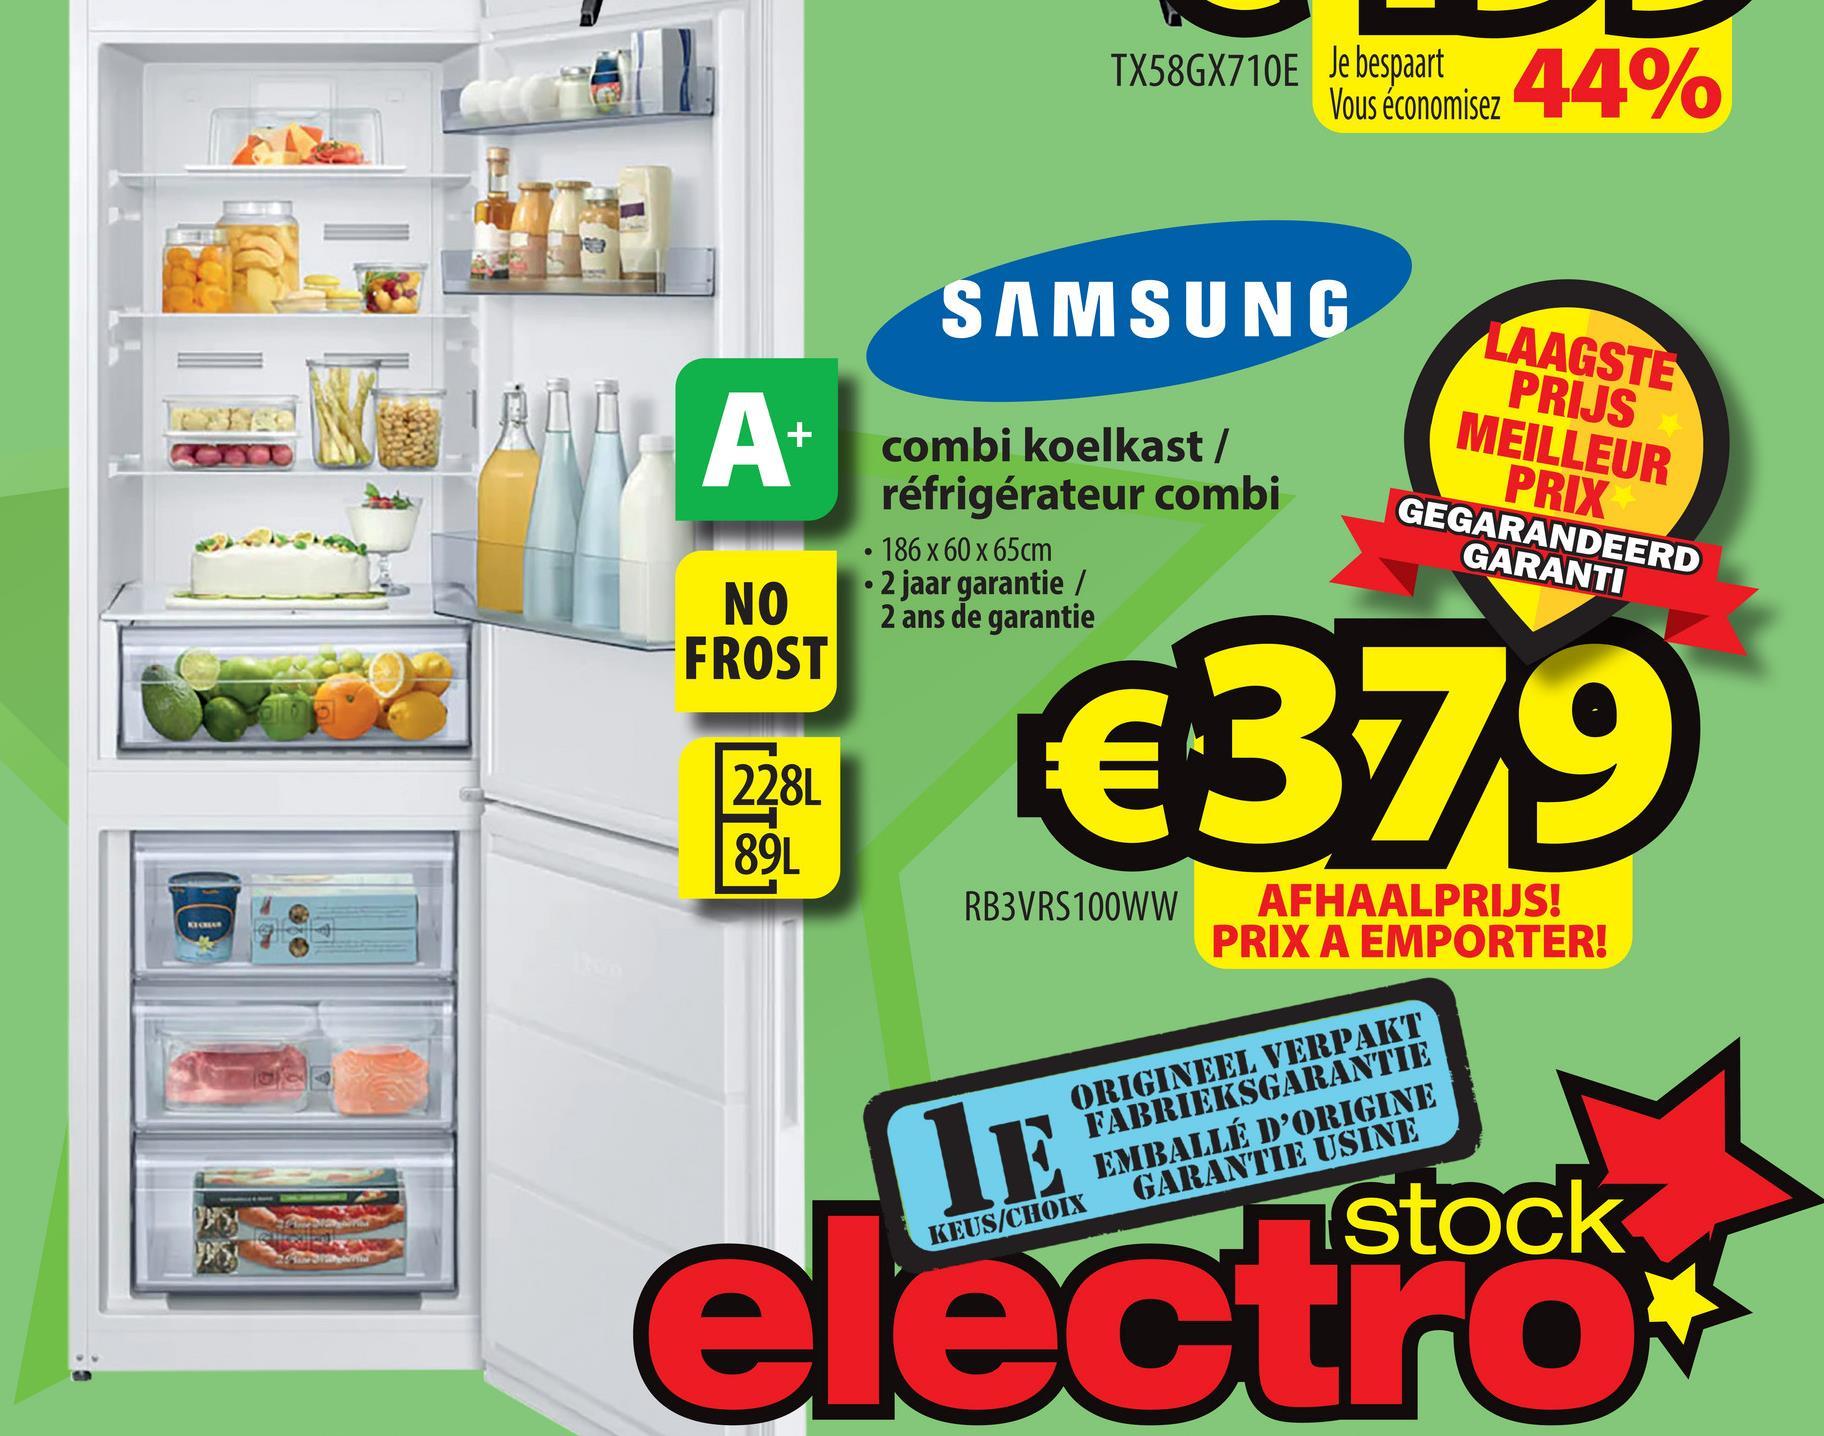 TX58GX710E Je bespaart Vous économisez SAMSUNG combi koelkast / réfrigérateur combi 186 x 60 x 65cm - 2 jaar garantie / 2 ans de garantie LAAGSTE PRIJS MEILLEUR PRIX GEGARANDEERD GARANTI NO FROST €379 228L 89L RB3VRS 100WW AFHAALPRIJS! PRIX A EMPORTER! ORIGINEEL VERPAKT FABRIEKSGARANTIE EMBALLÉ D'ORIGINE KEUS/CHOIX GARANTIE USINE LE electrock